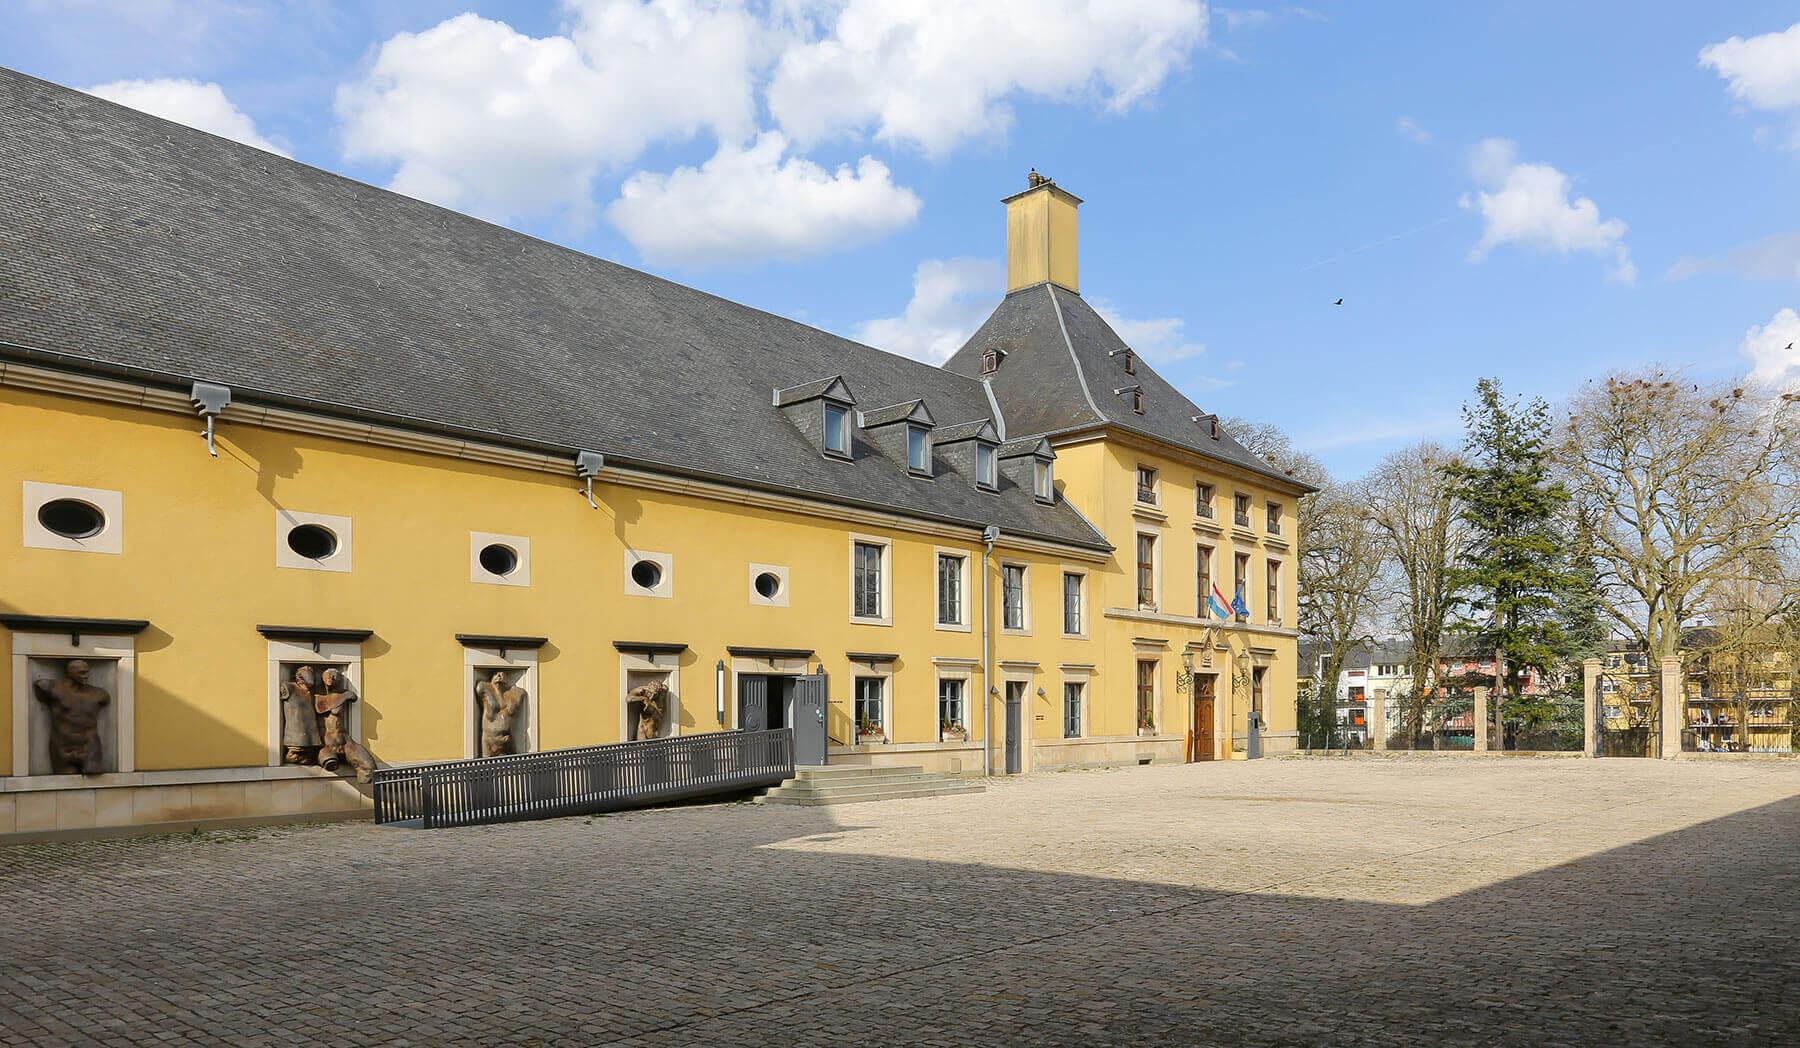 Château Collart à Bettembourg